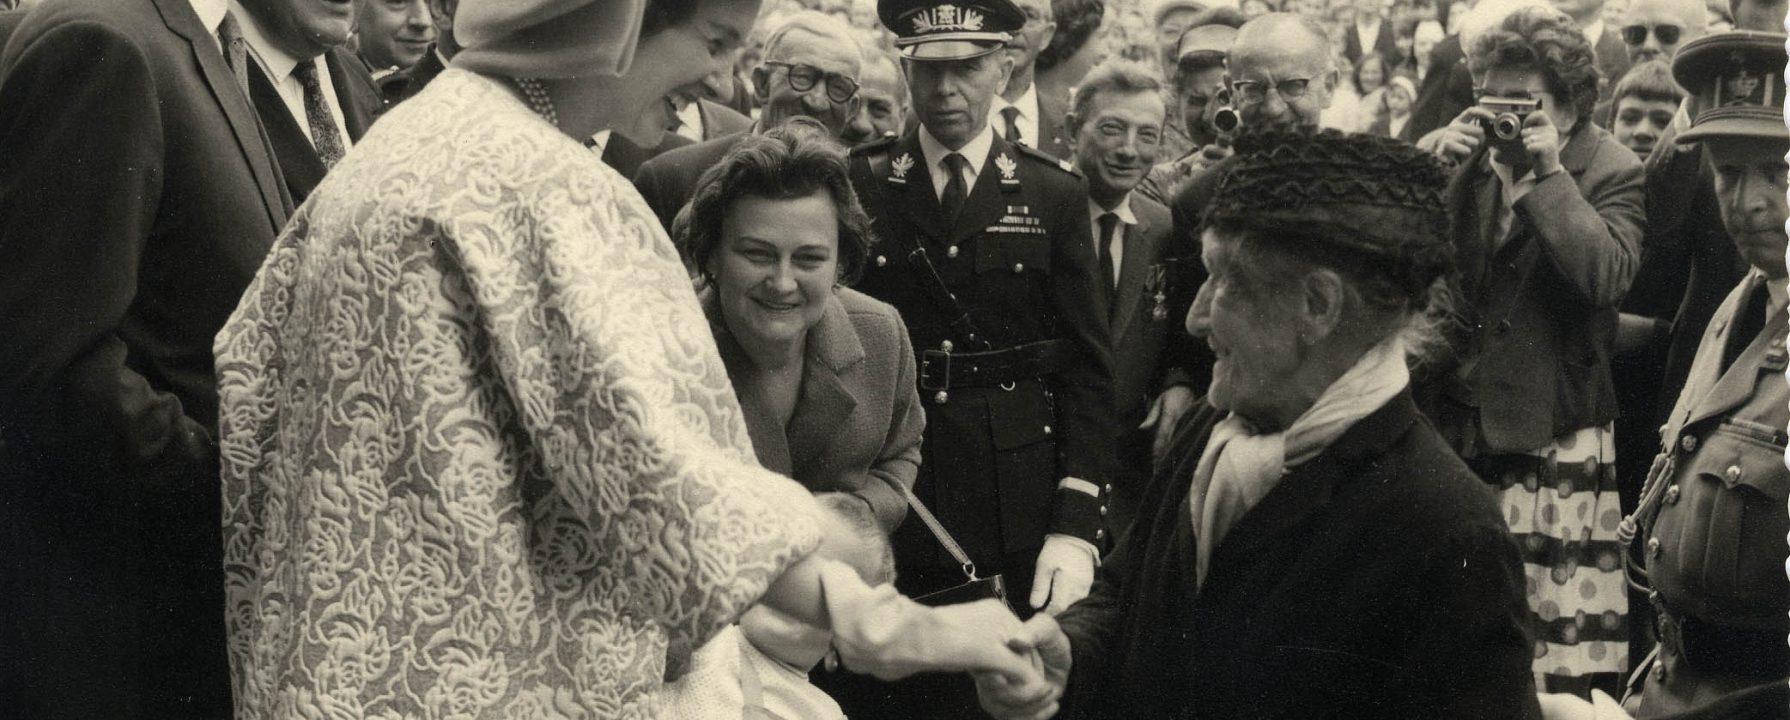 Koning Boudewijn en Koningin Fabiola 1964